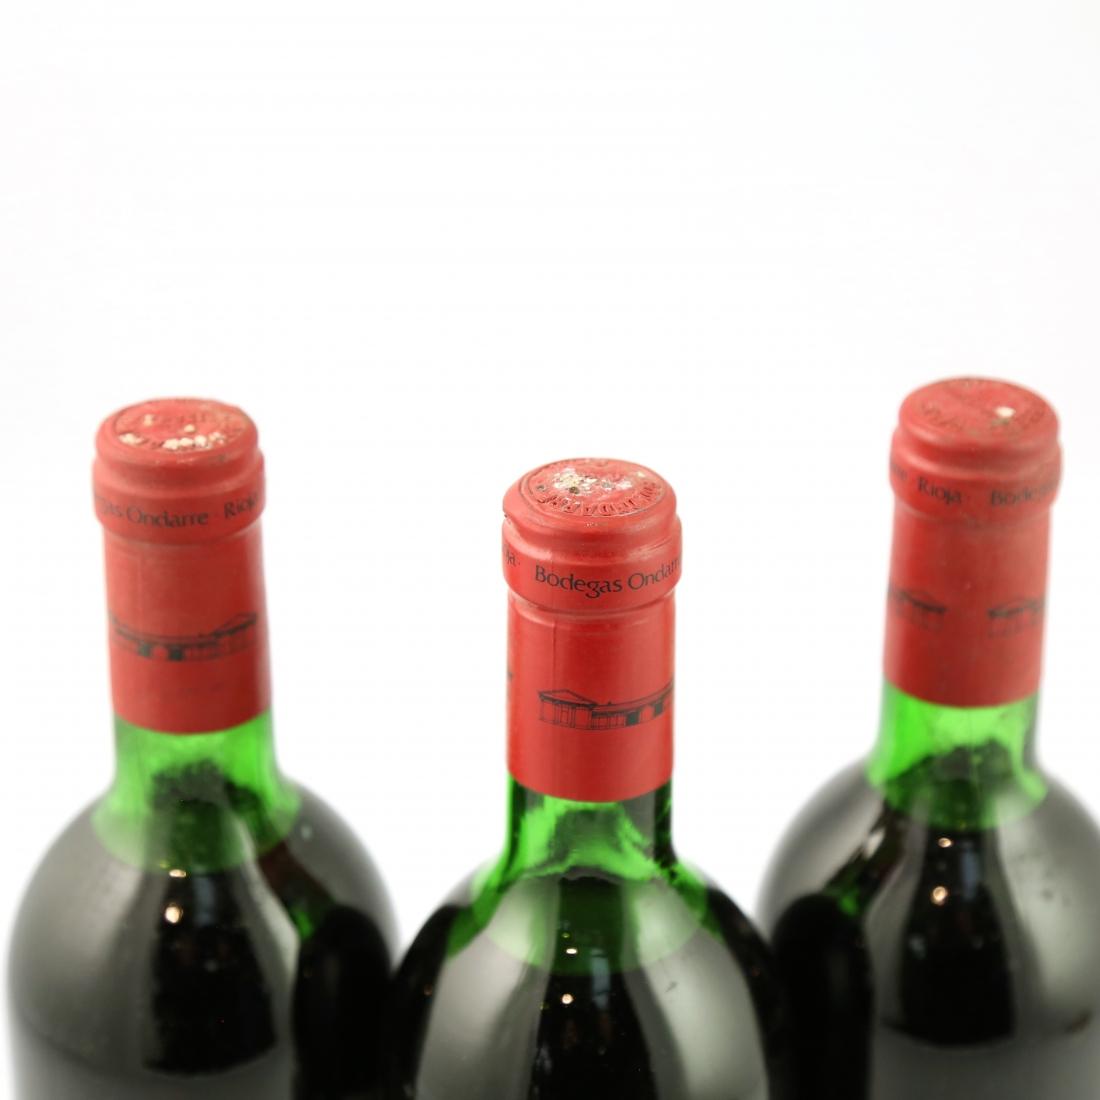 Ondarre 1981 Rioja Reserva 3x75cl